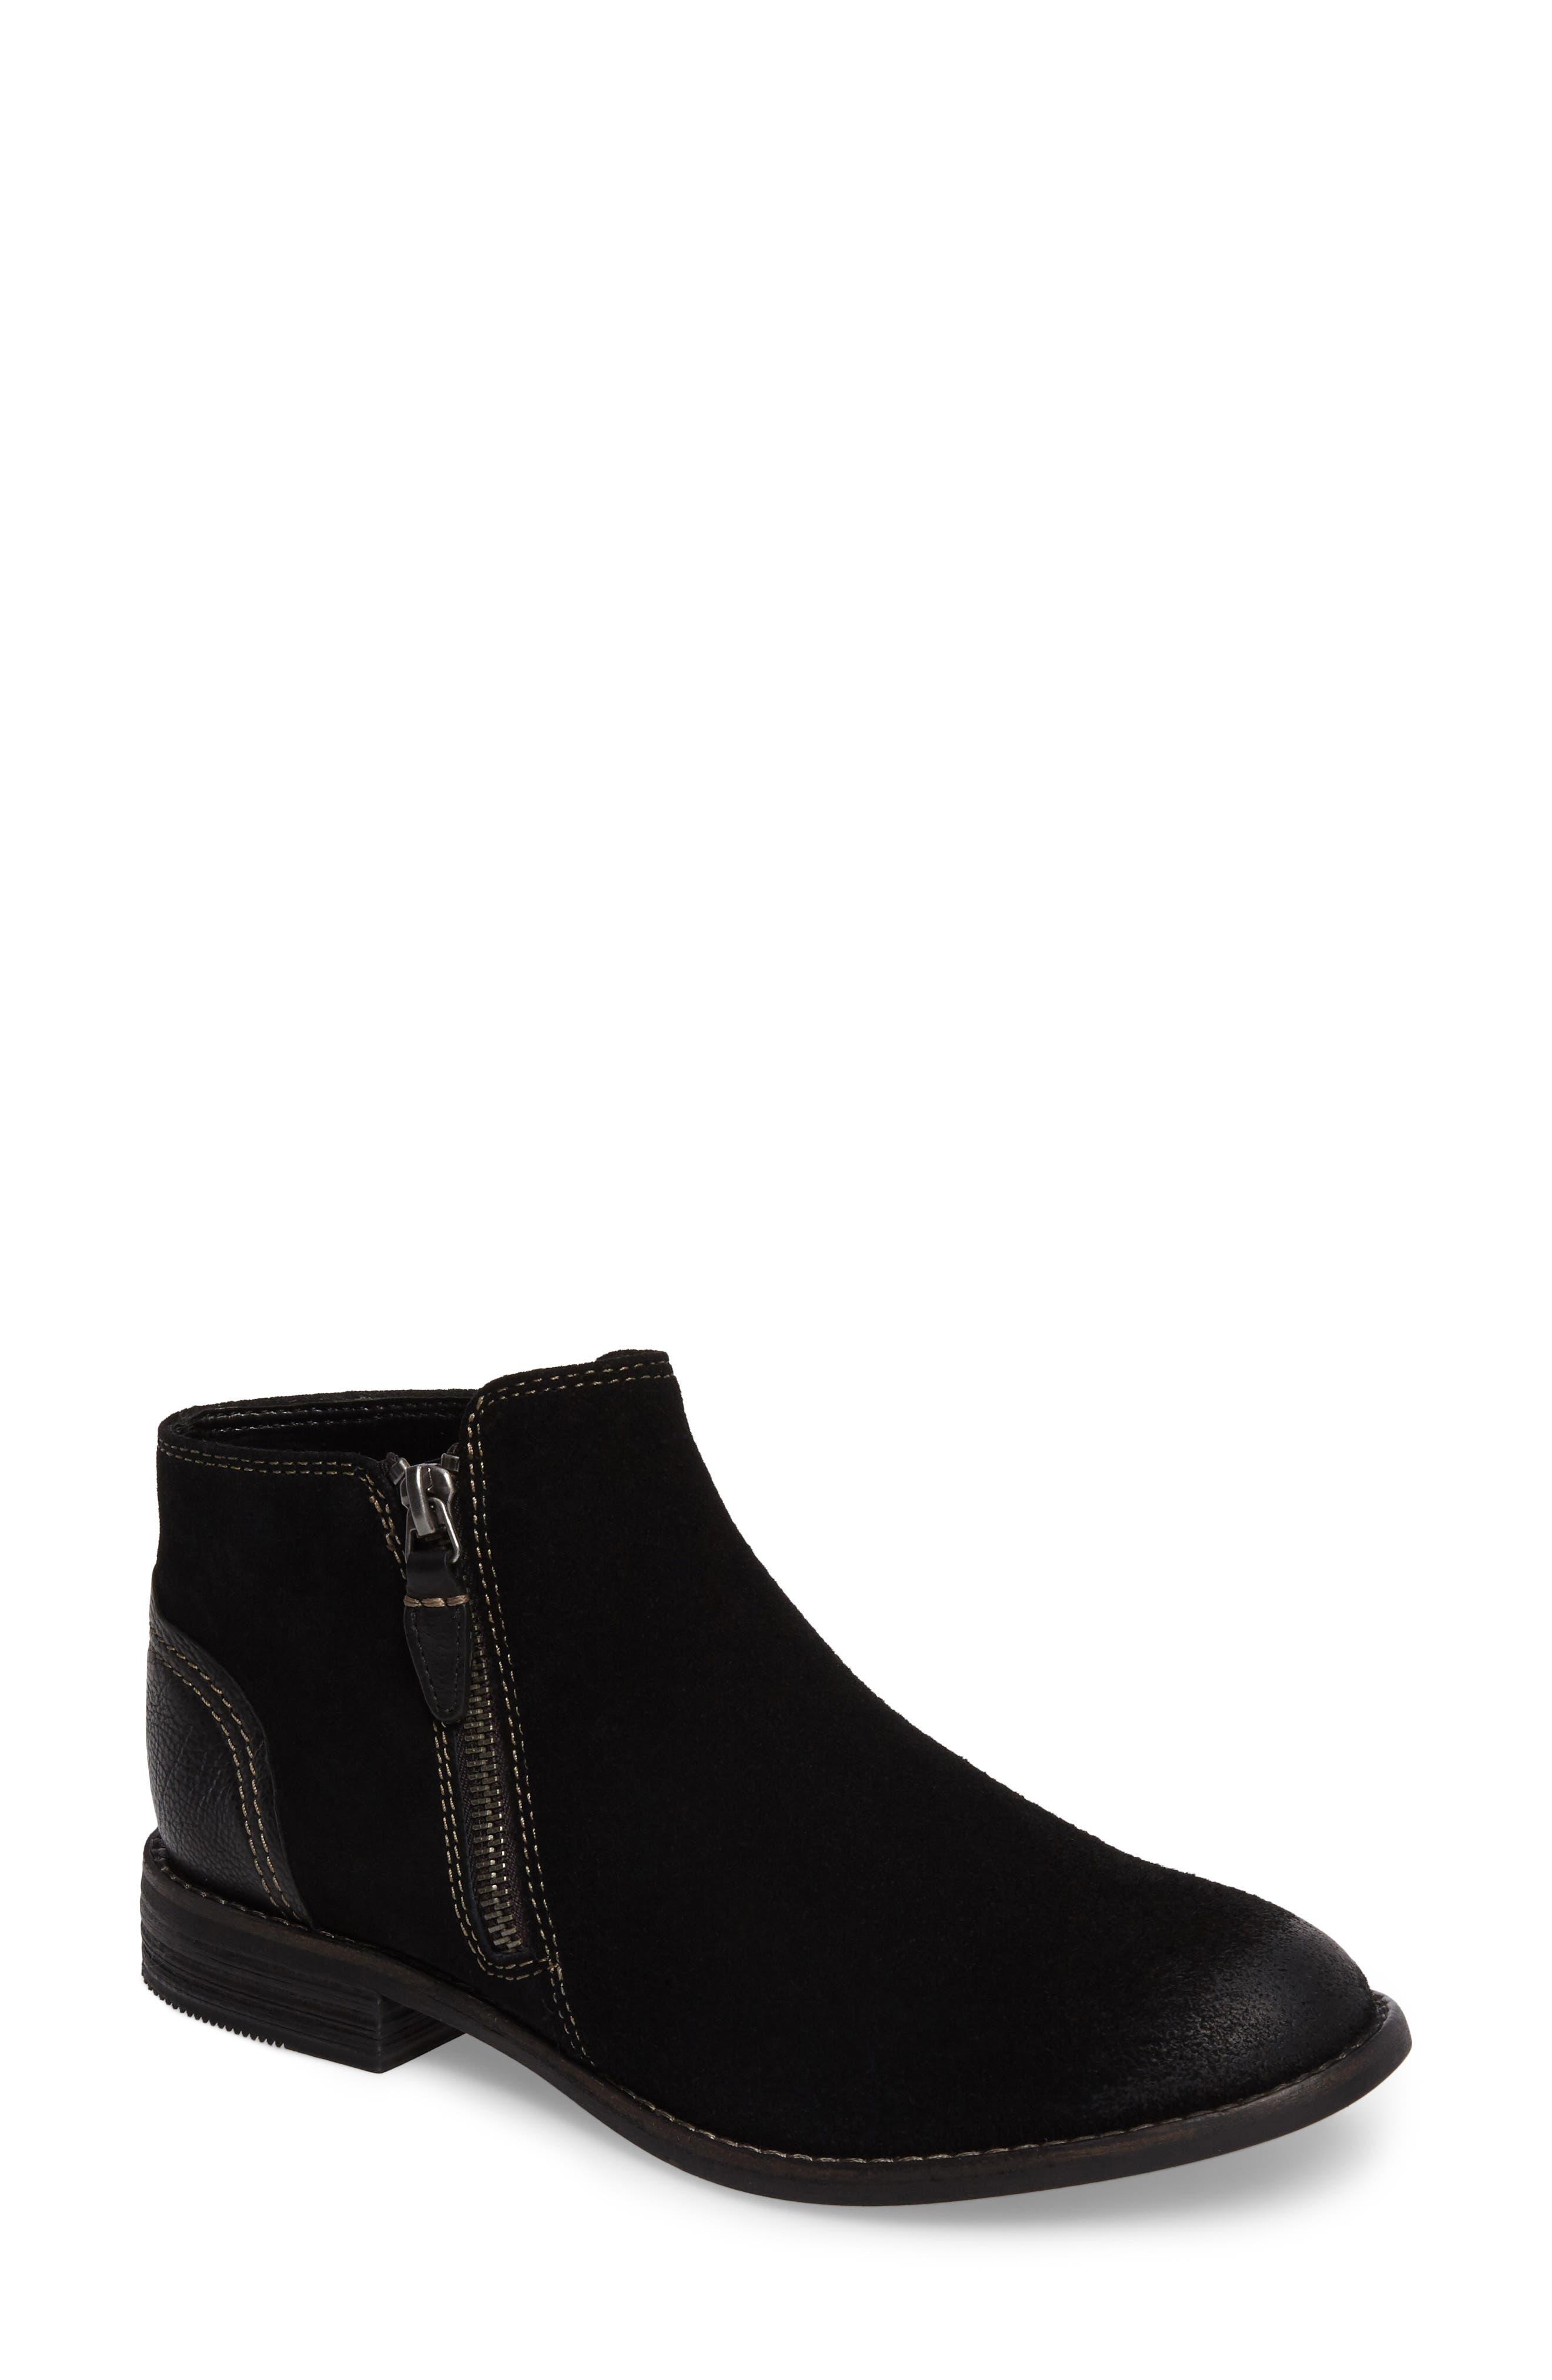 Clarks Maypearl Juno Ankle Boot, Black